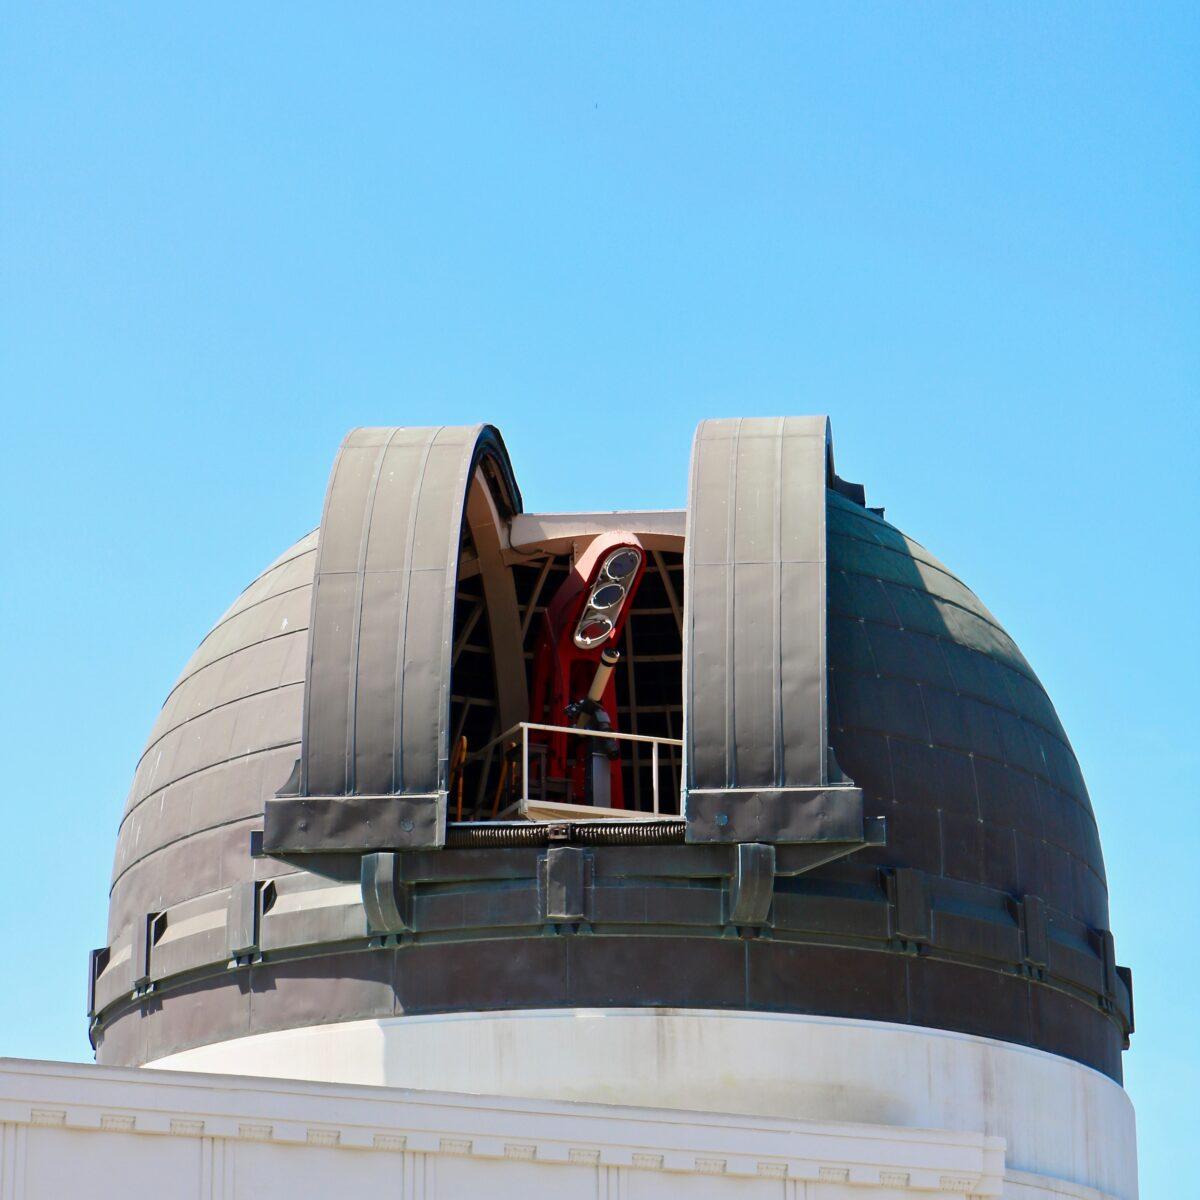 Observatory dome. Photo by James Lee (https://unsplash.com/photos/qrOZhUu5_u0)